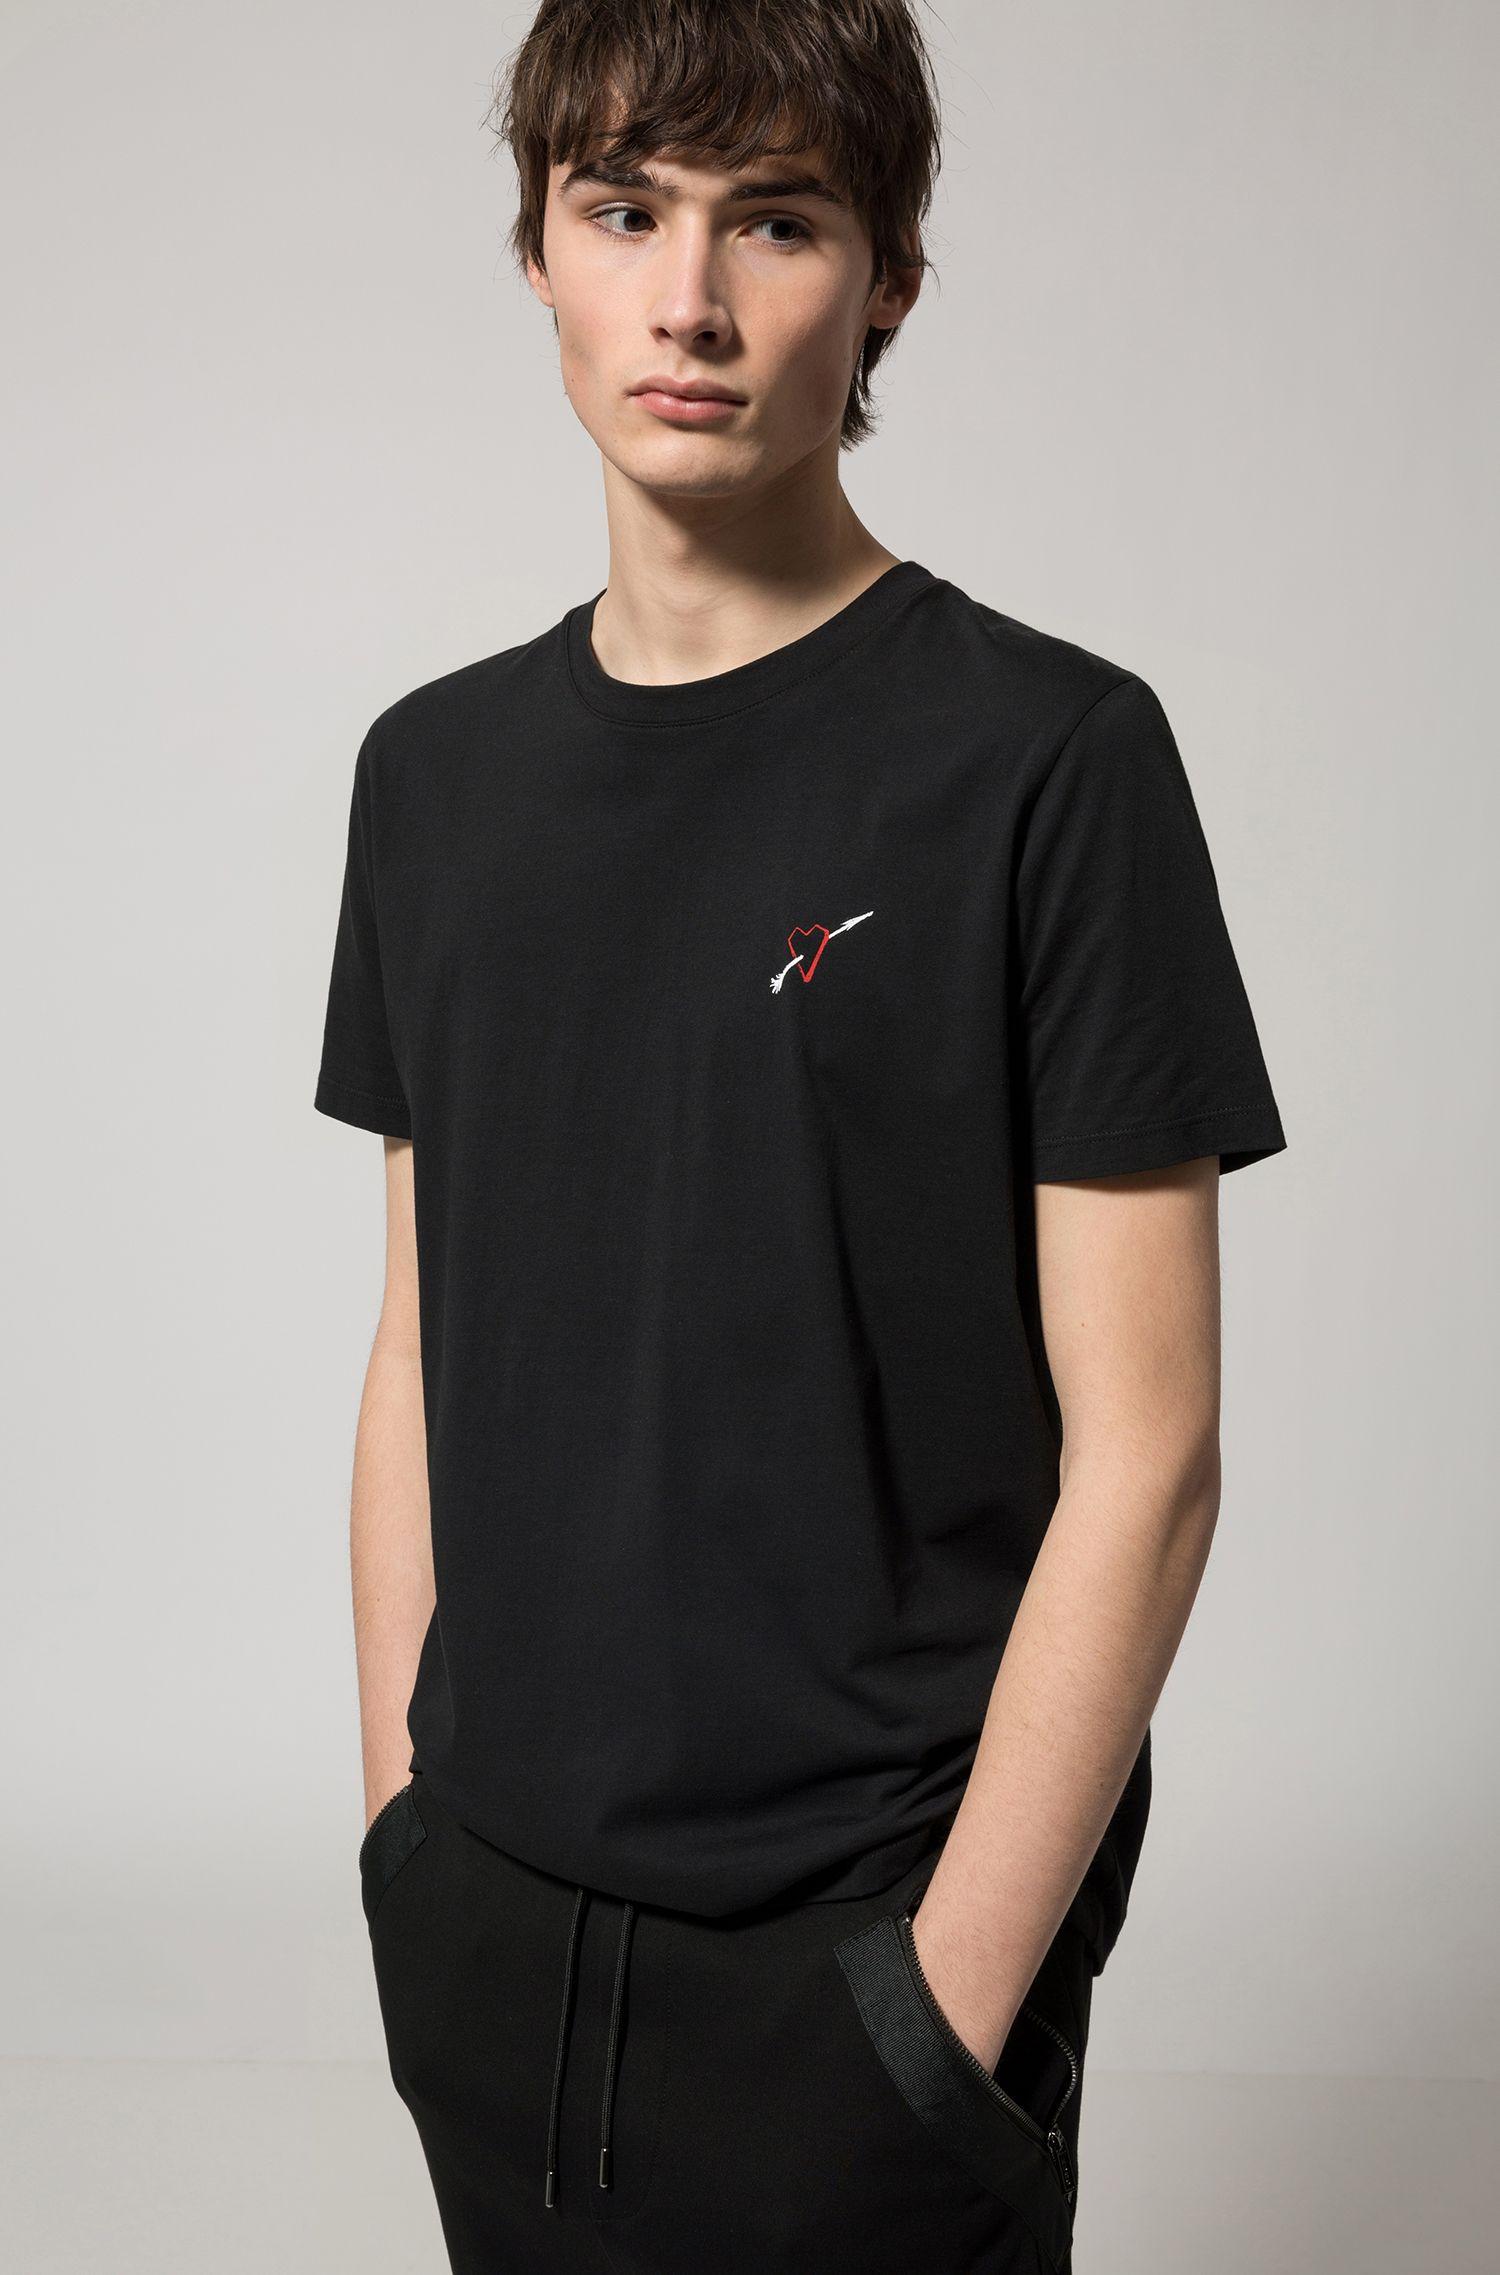 Cotton Graphic T-Shirt | Dalentine